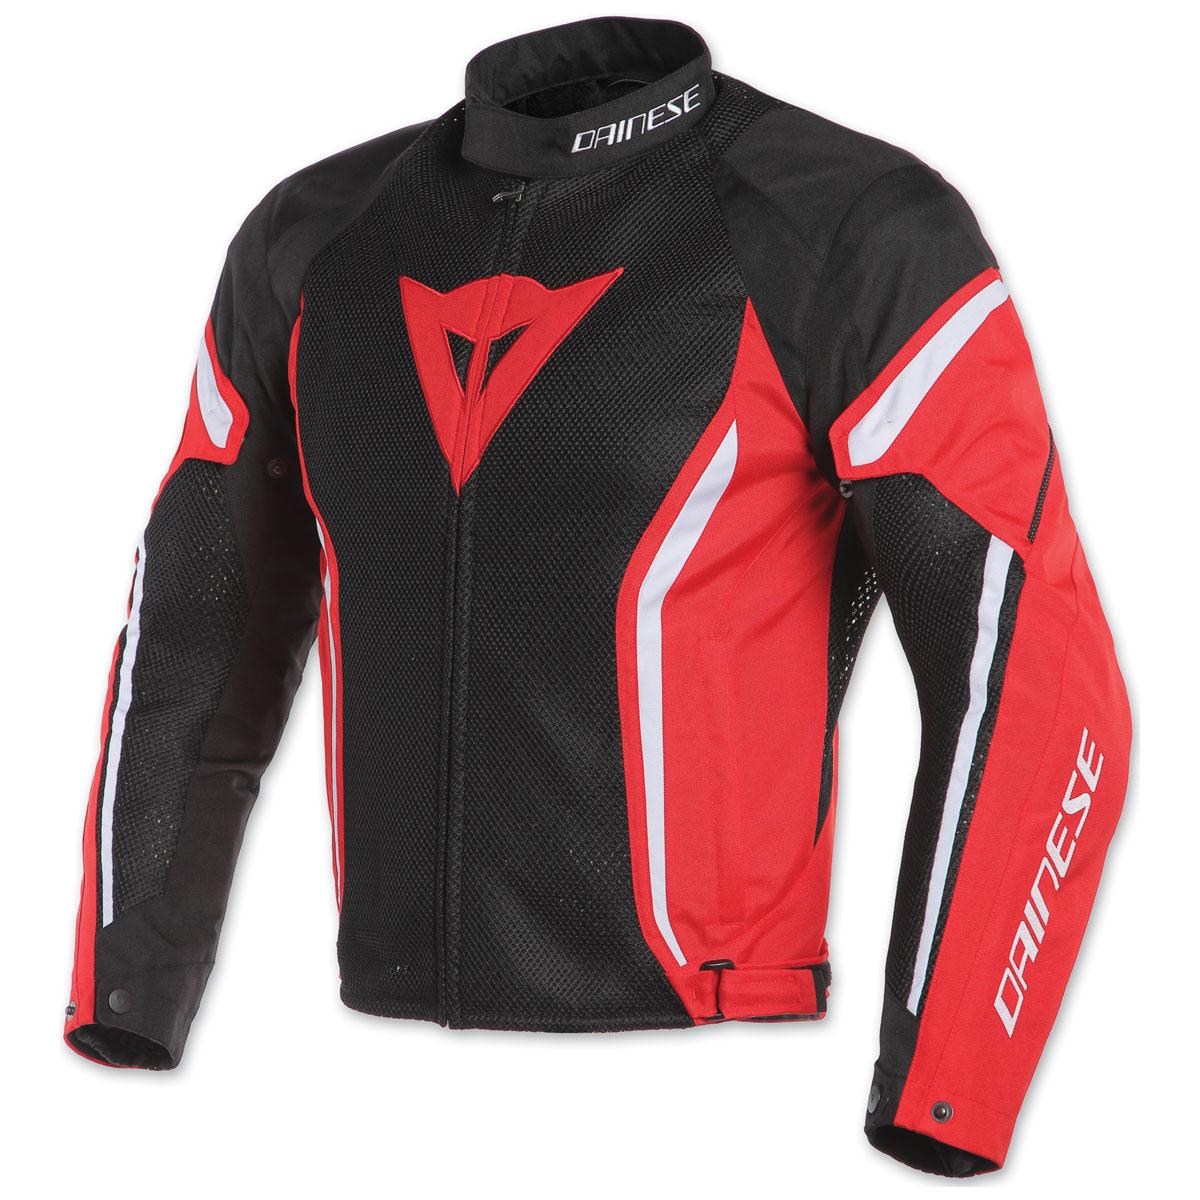 Dainese Men's Air Crono 2 Black/Red/White Textile Jacket